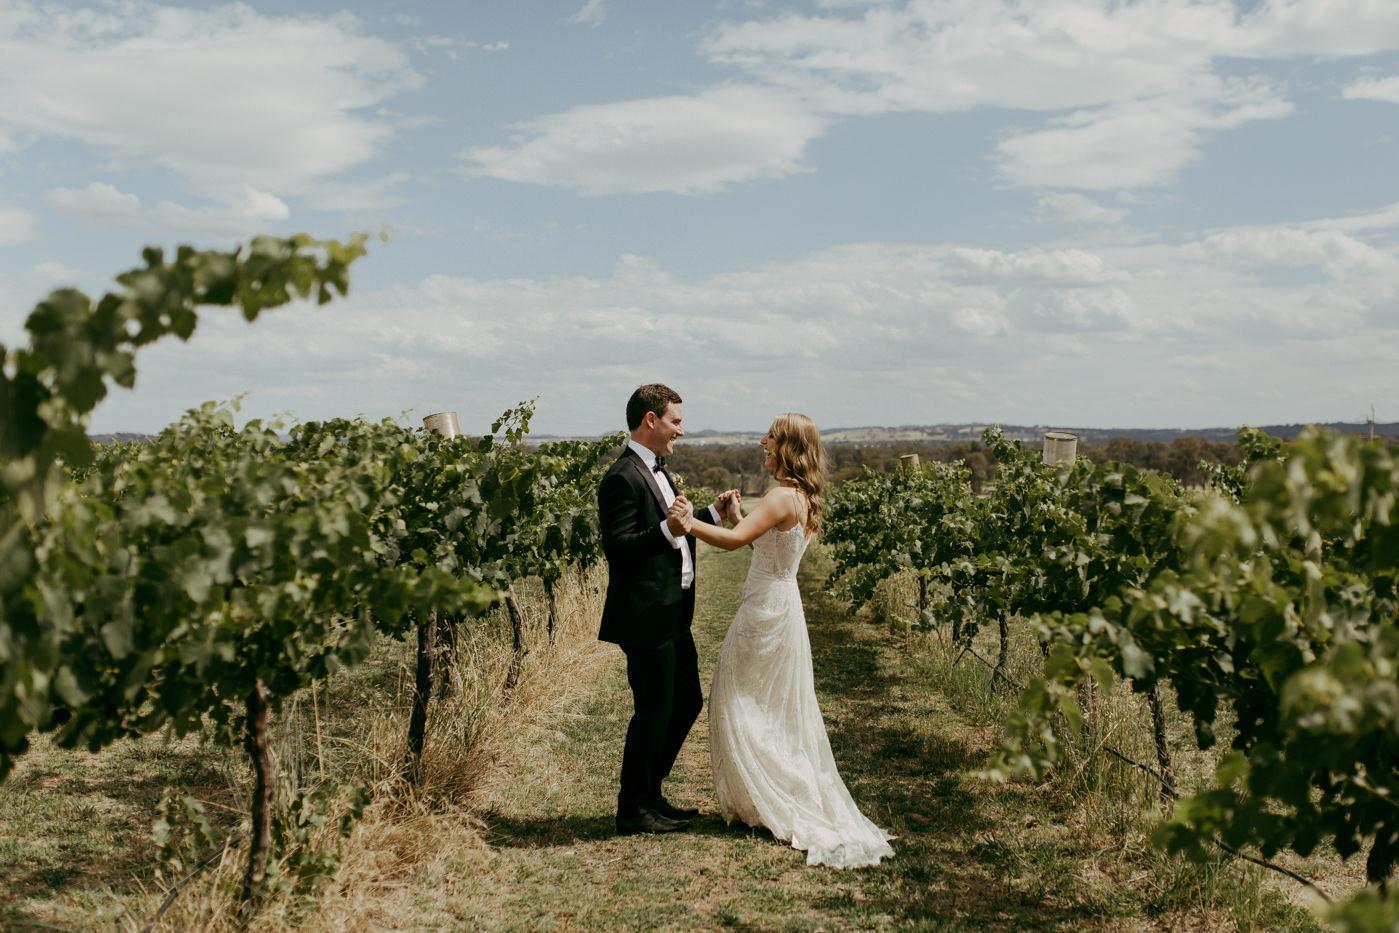 Anthony & Eliet - Wagga Wagga Wedding - Country NSW - Samantha Heather Photography-70.jpg